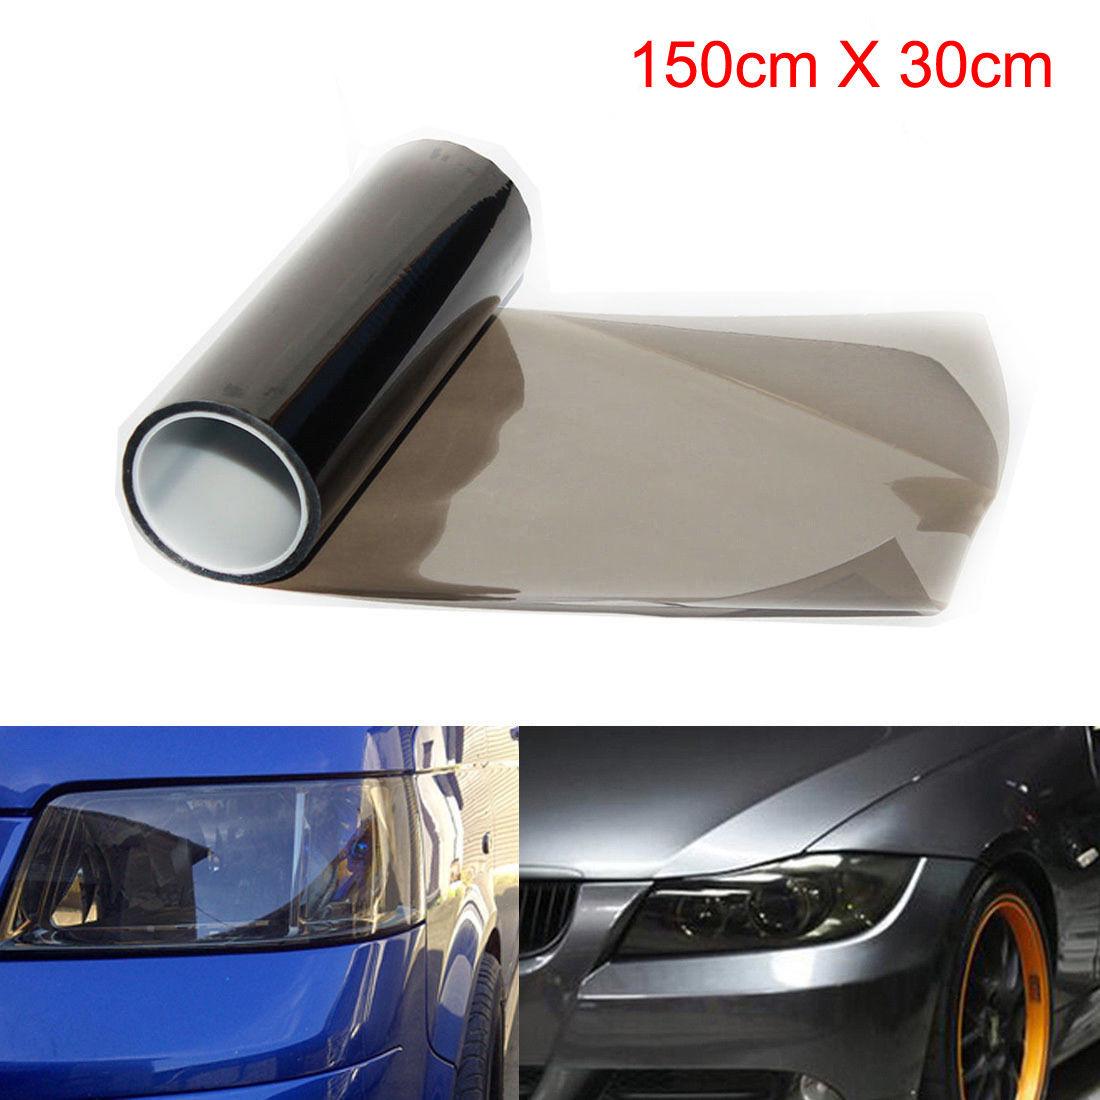 30x150cm preto escuro matiz filme nevoeiro luzes da cauda faróis matiz carro van envoltório para luzes traseiras faróis auto lado adesivos